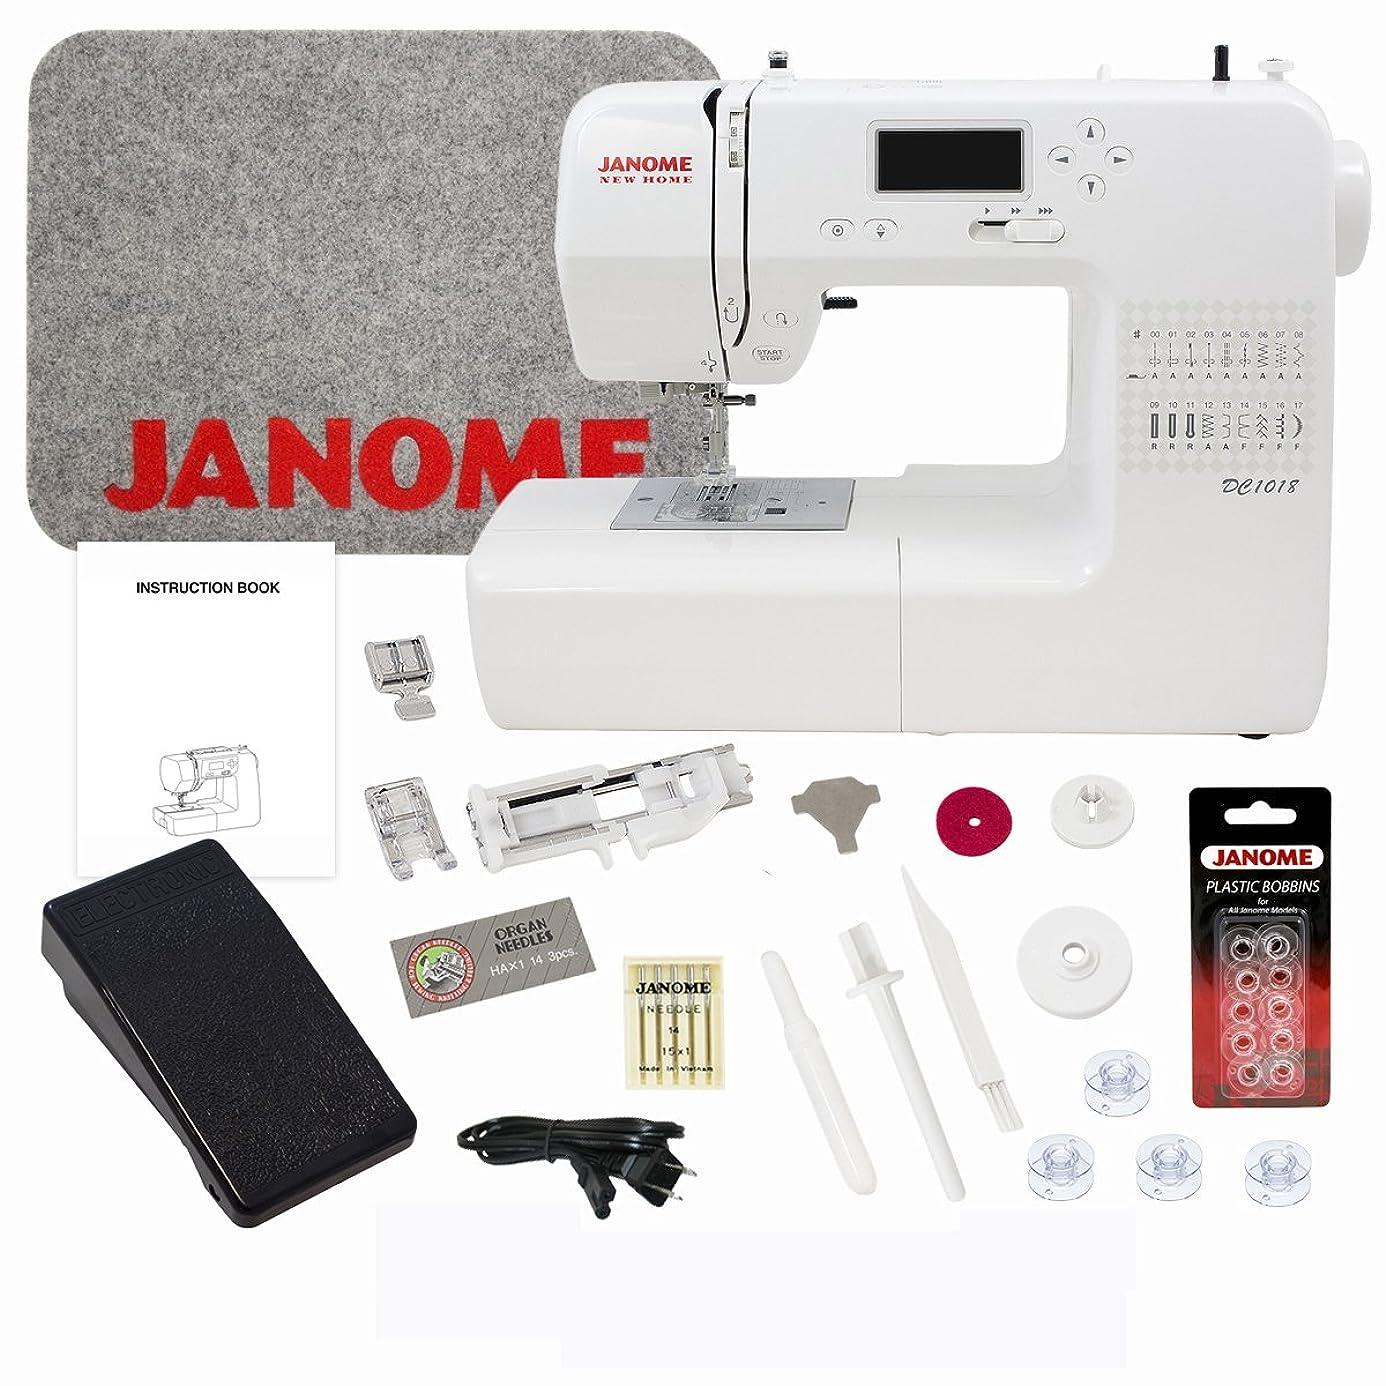 Janome DC1018 Sewing Machine with Bundle nmz4306401